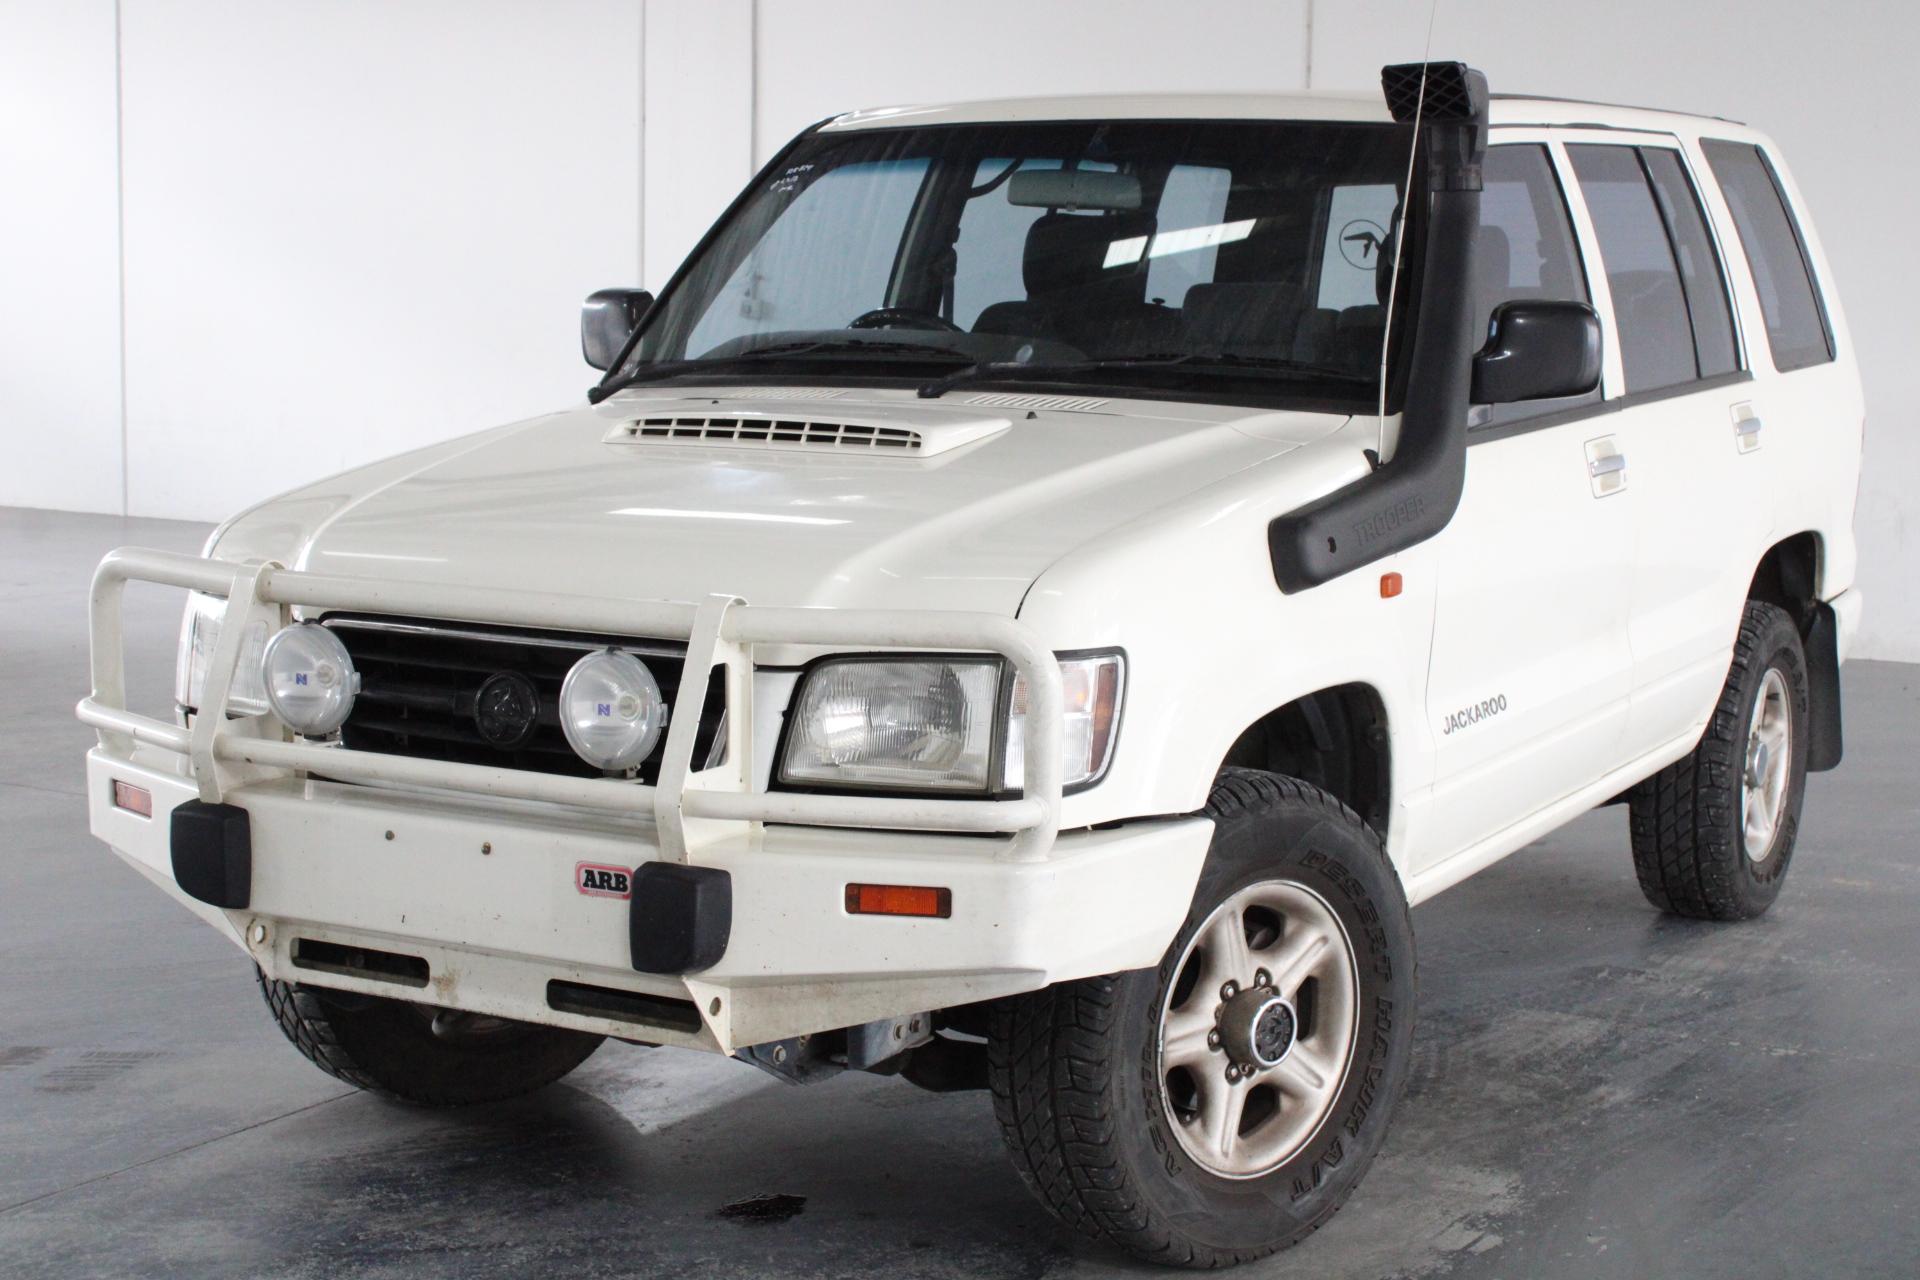 2000 Holden Jackaroo Olympic Edition Turbo Diesel Manual 7 Seats Wagon